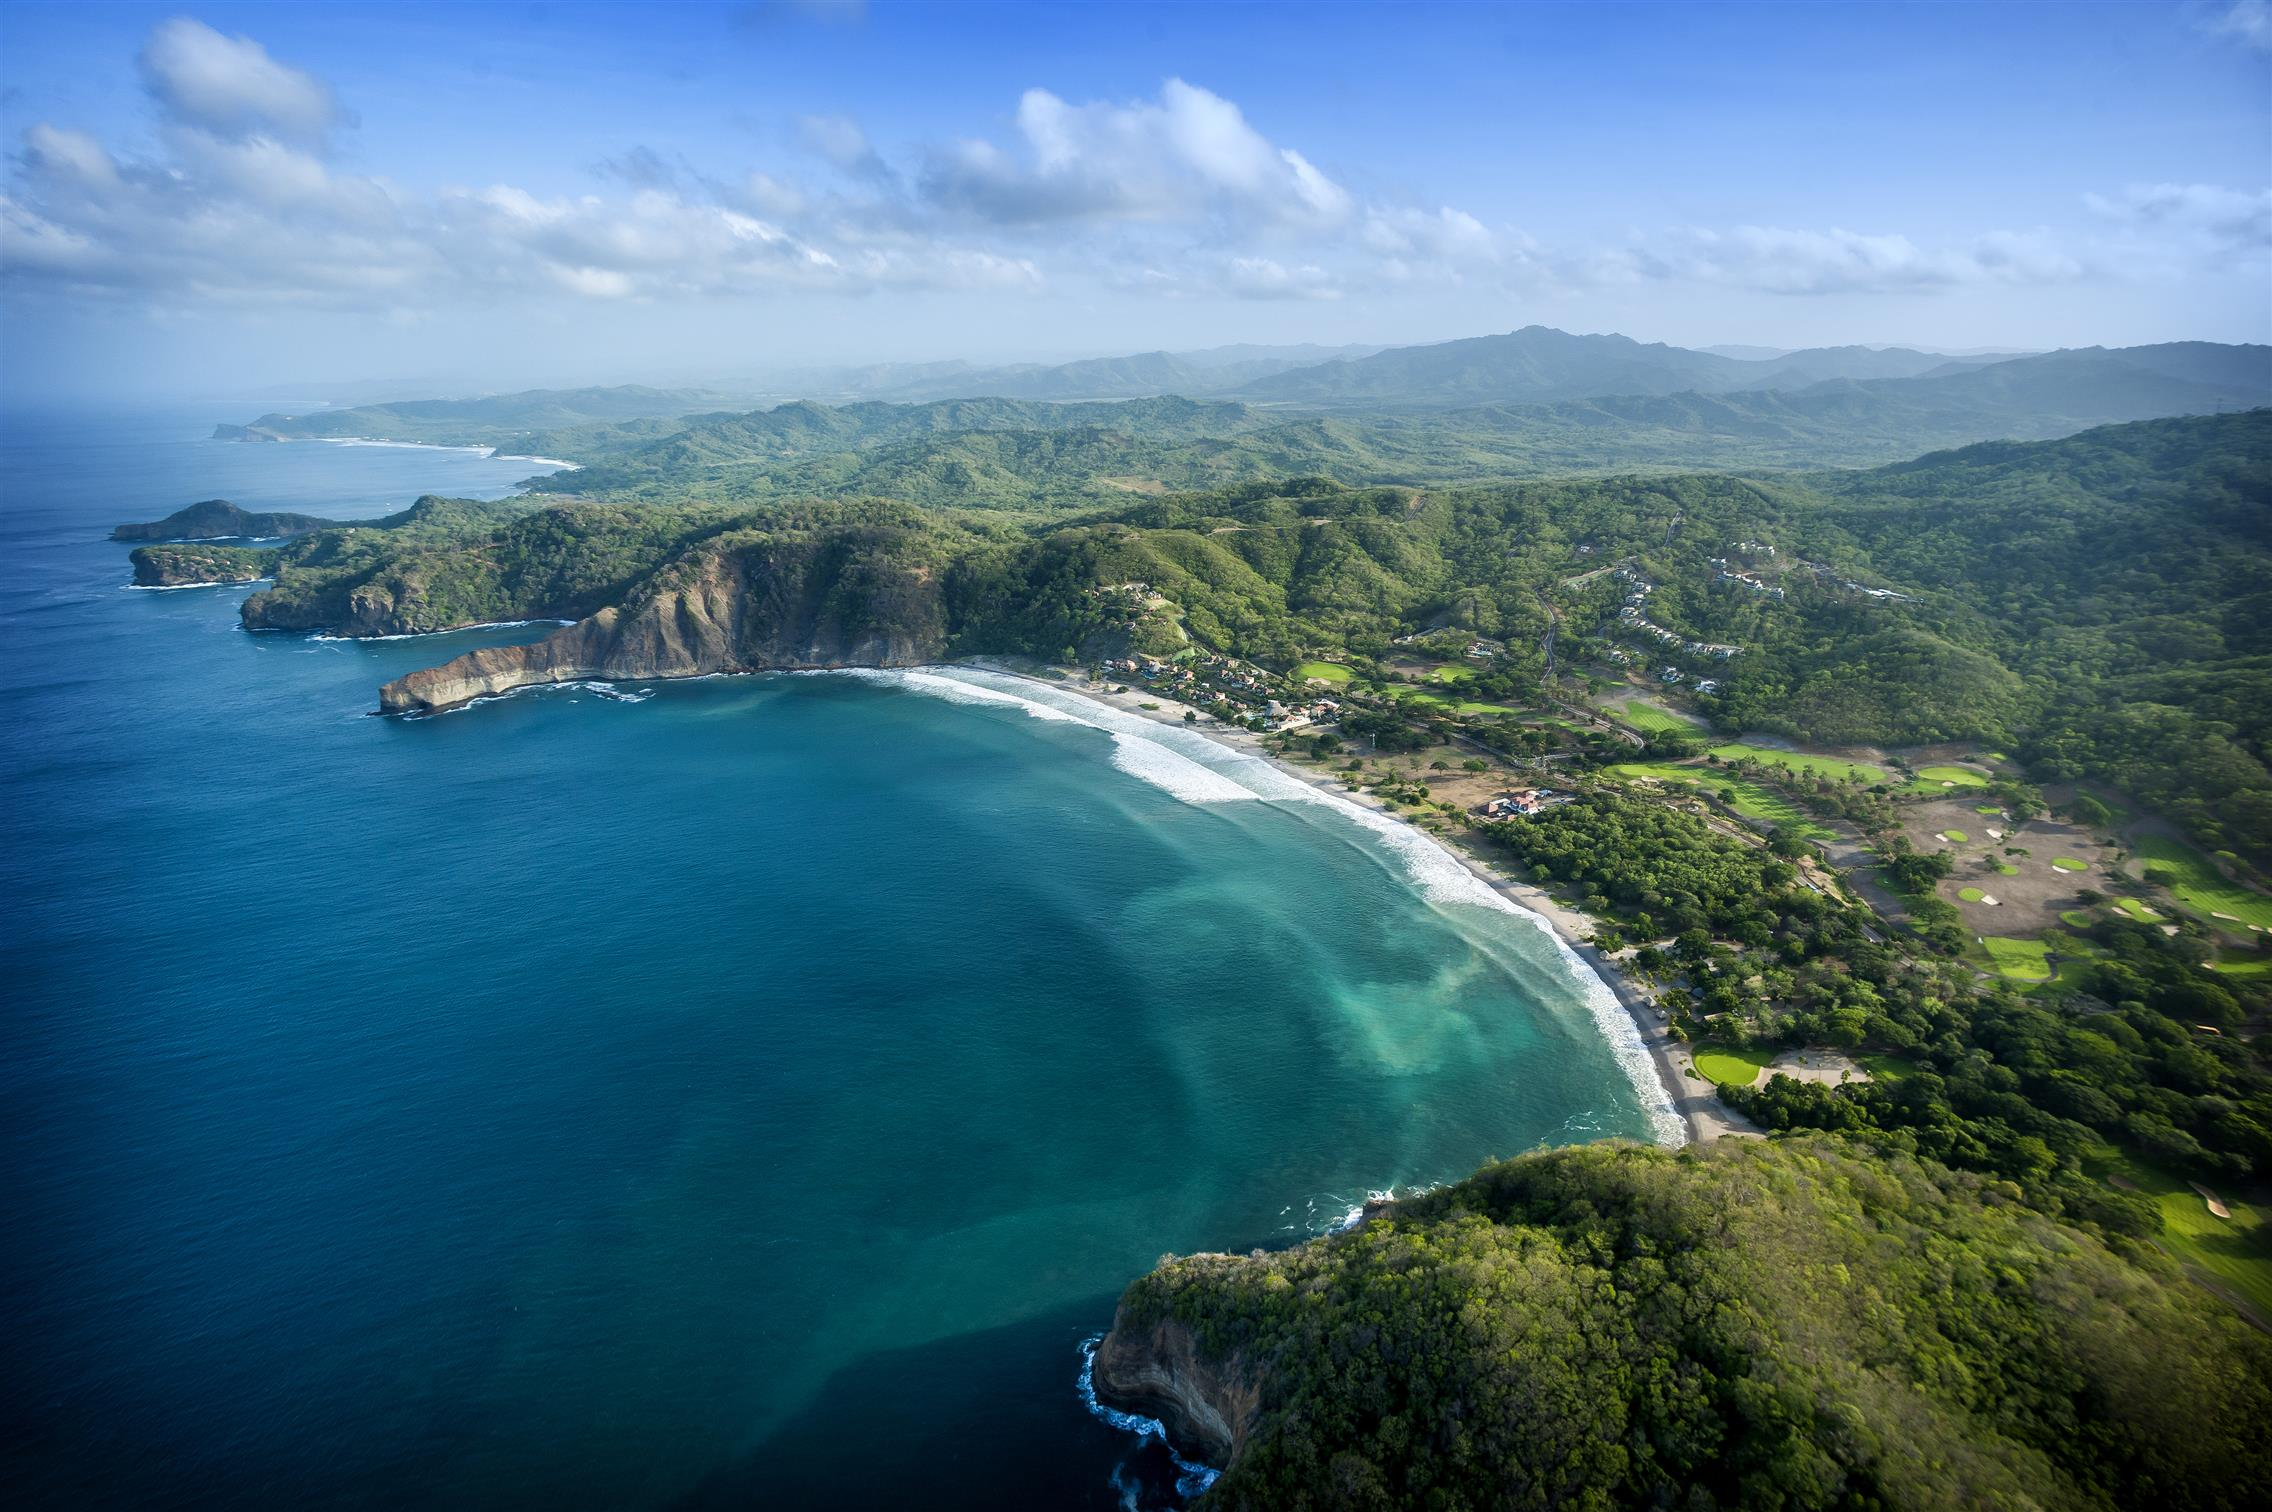 Emerald Coast Nicaragua S Hidden Jewel Cnn Travel